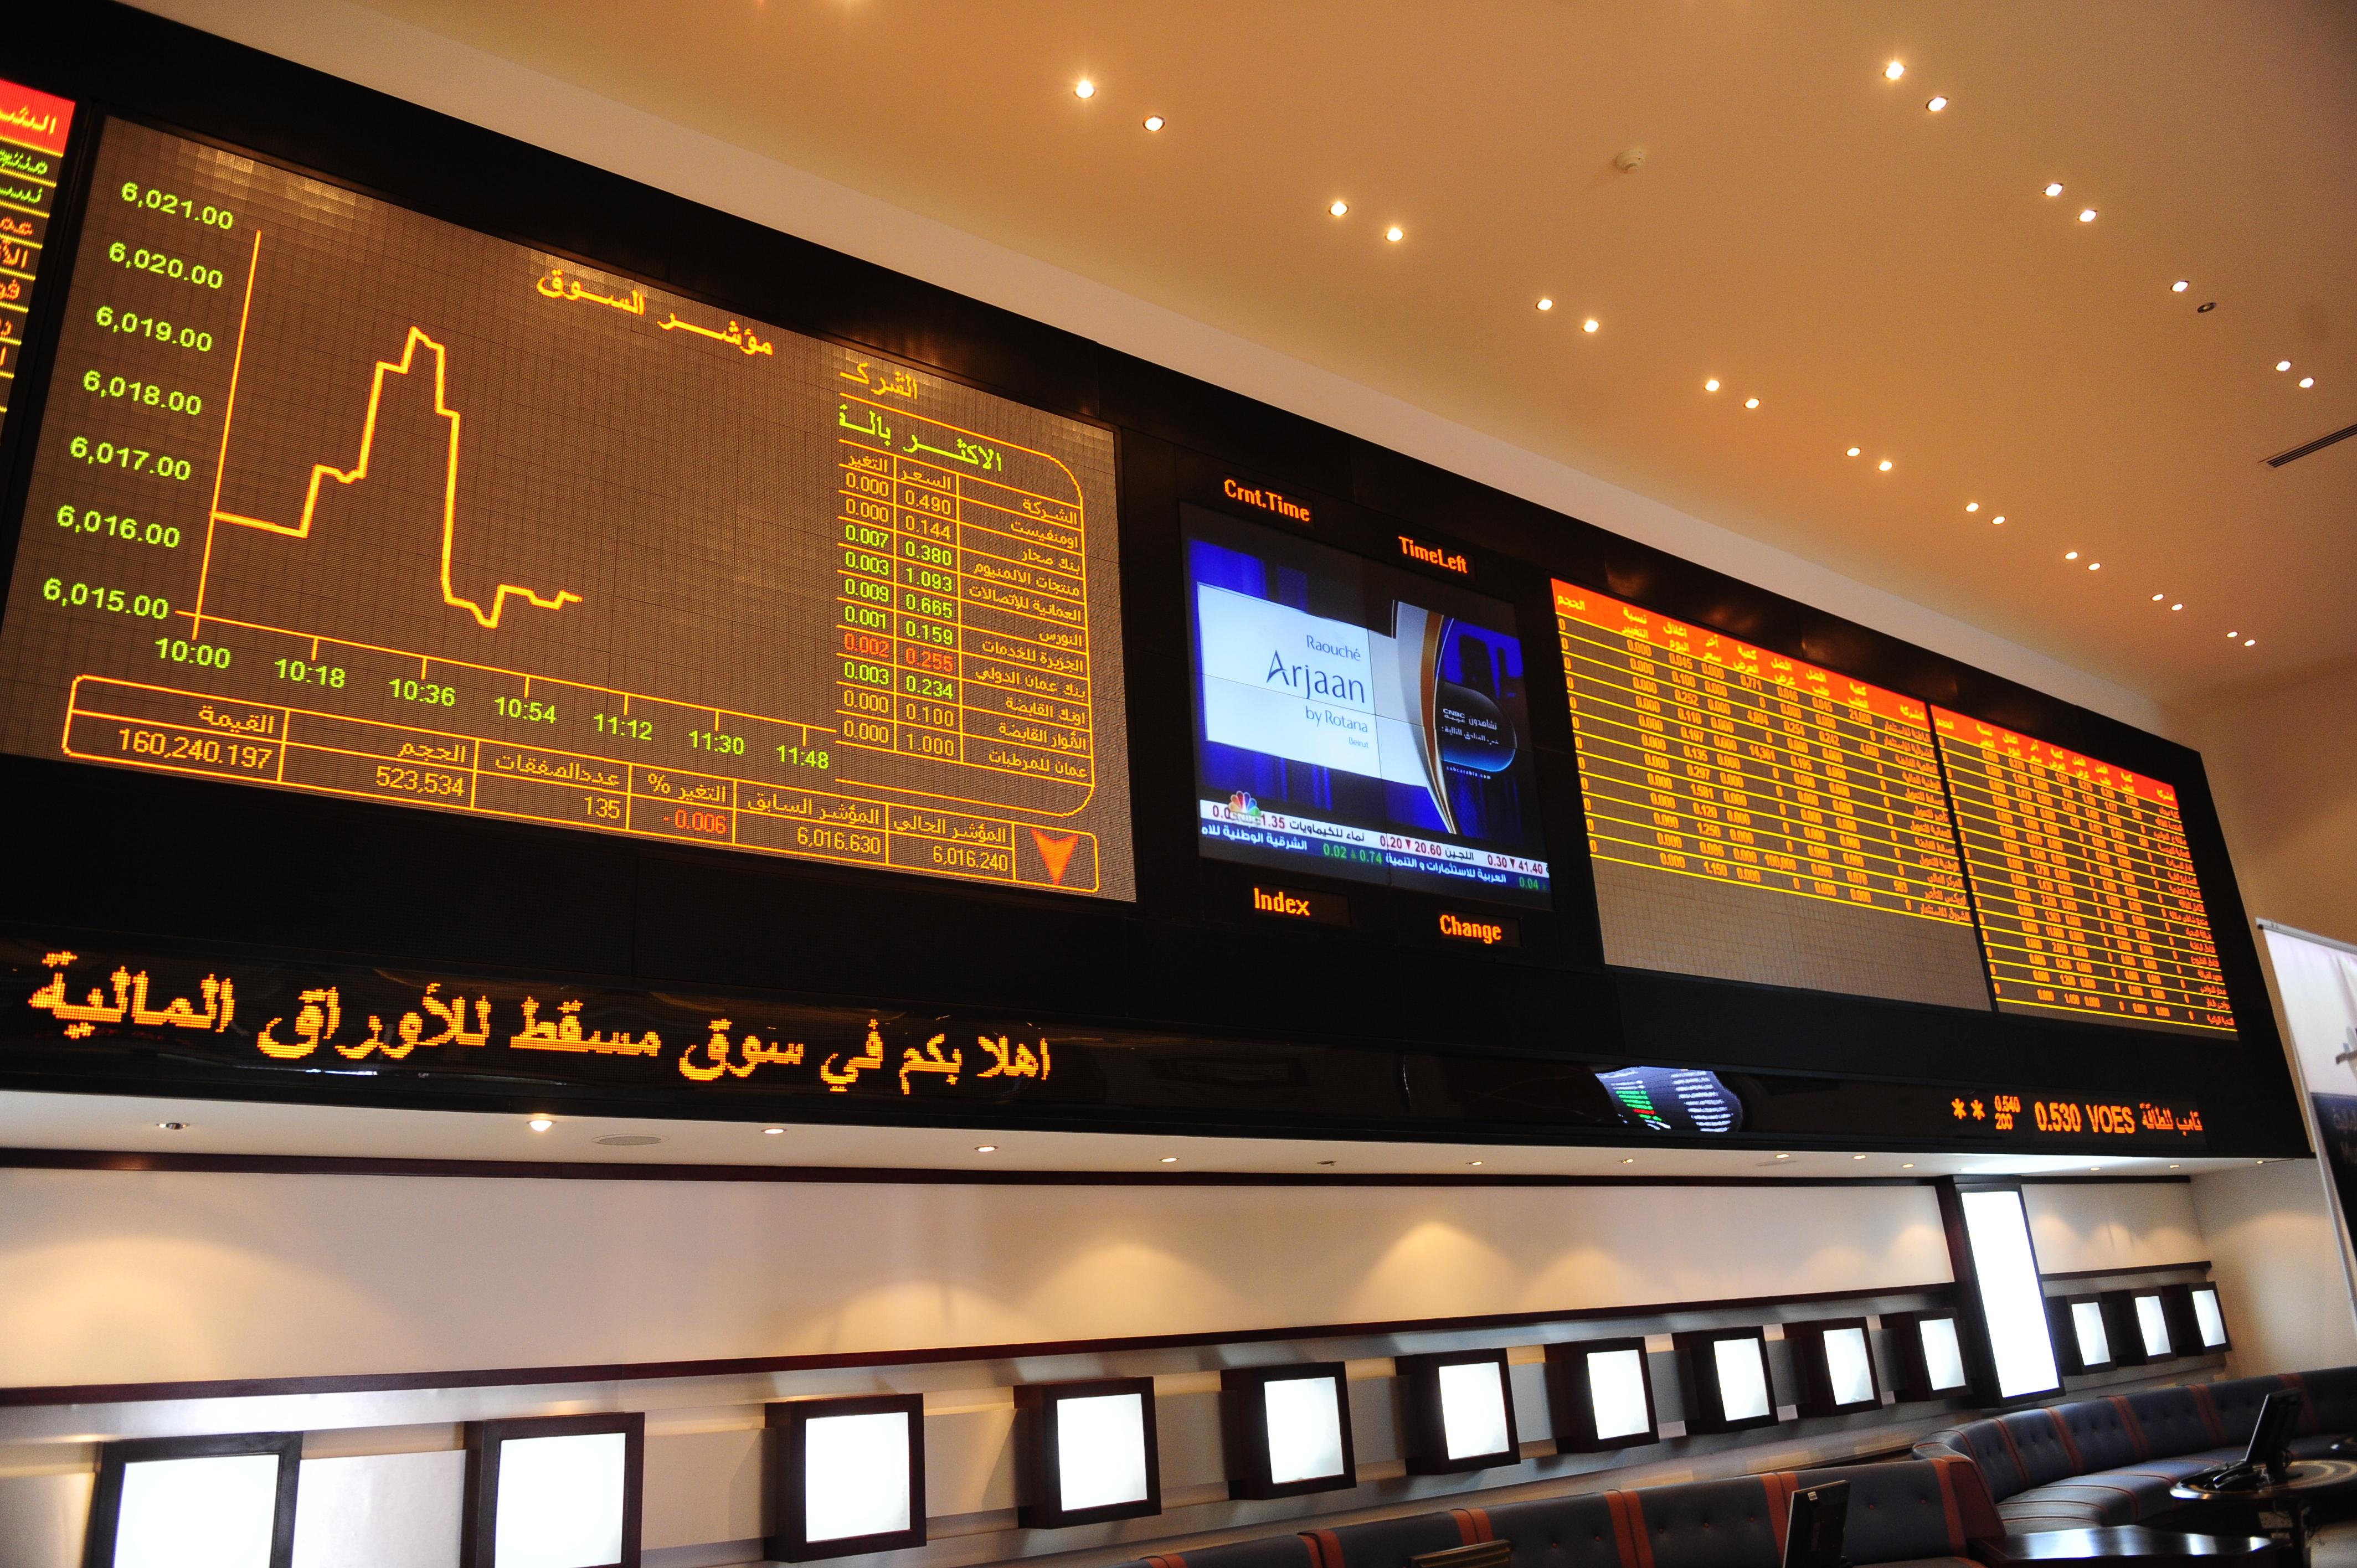 Oman Orix shares hit 'circuit breaker' limit